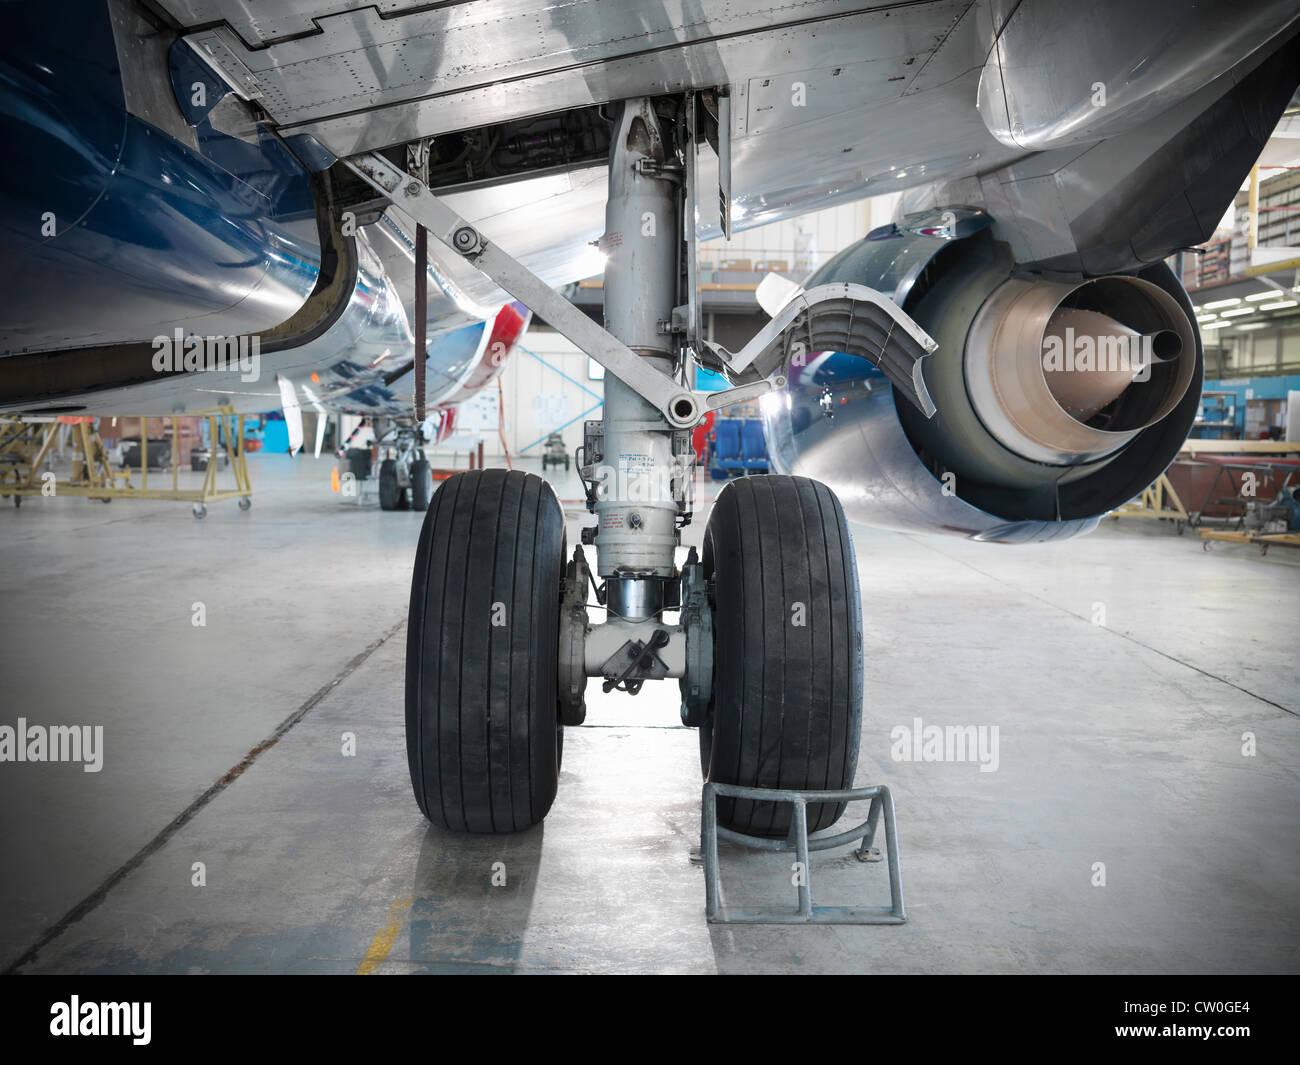 Nahaufnahme von Flugzeug-Räder im hangar Stockbild